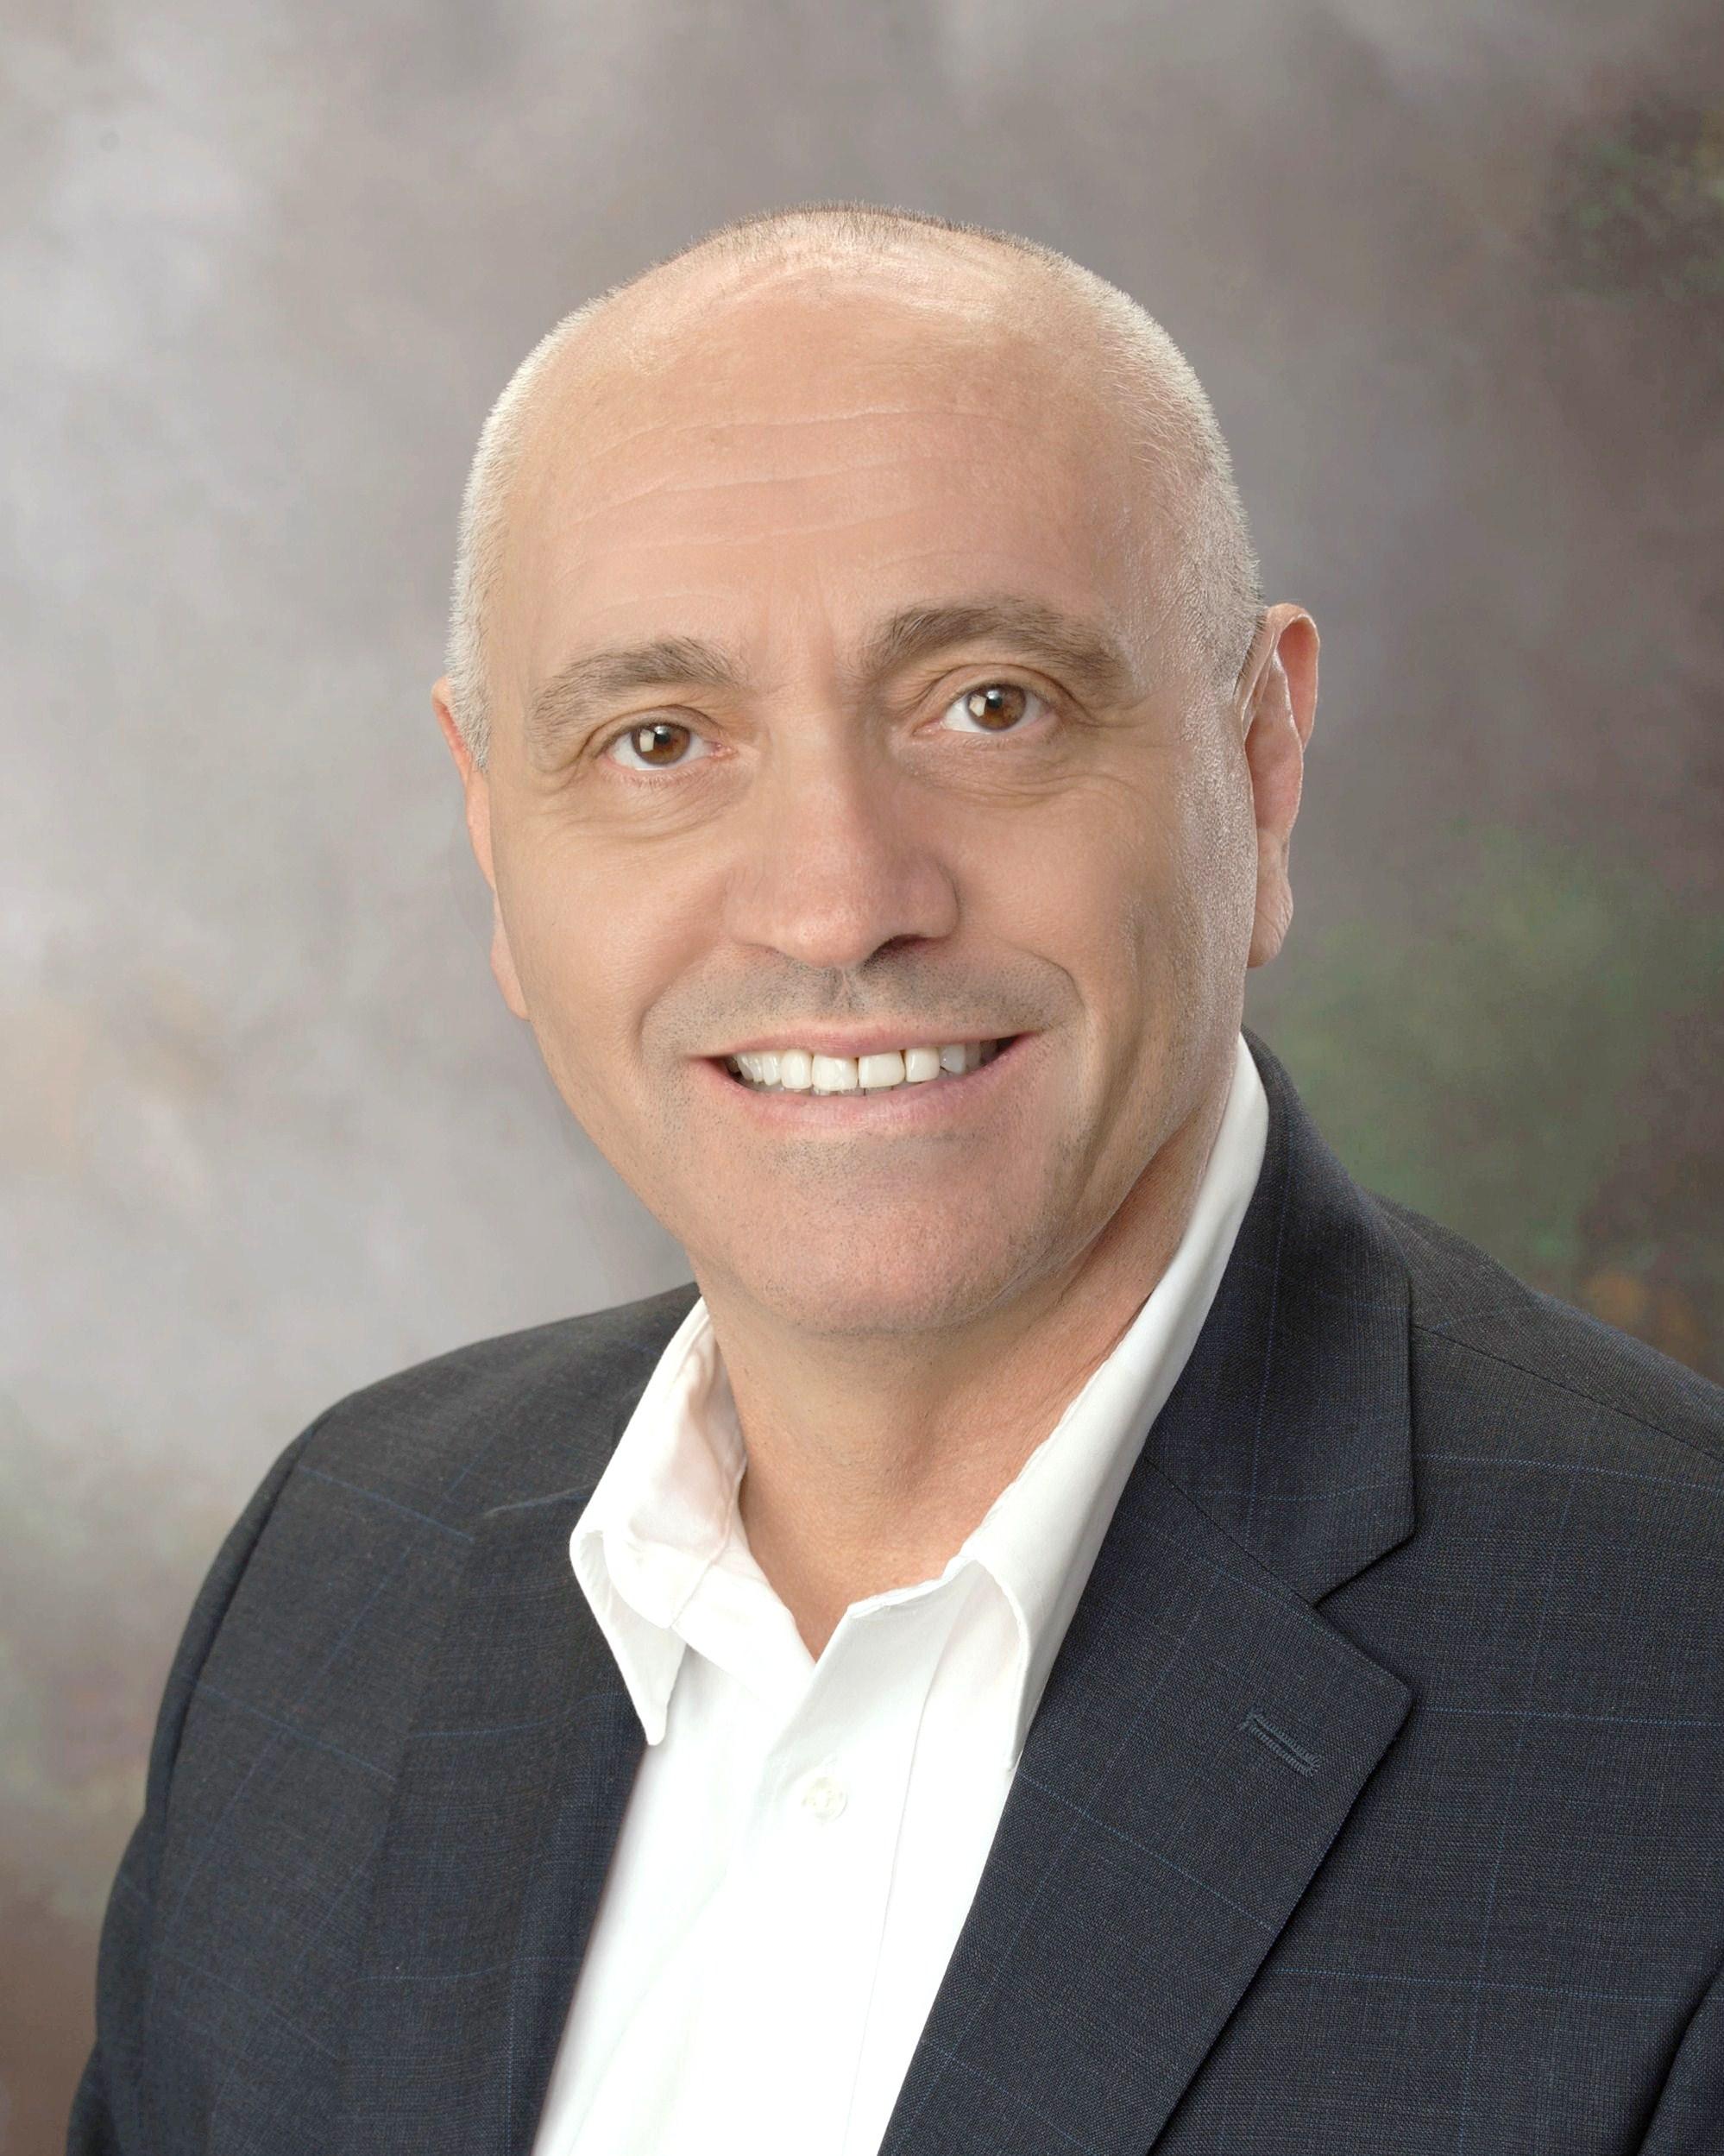 Joe DeMello